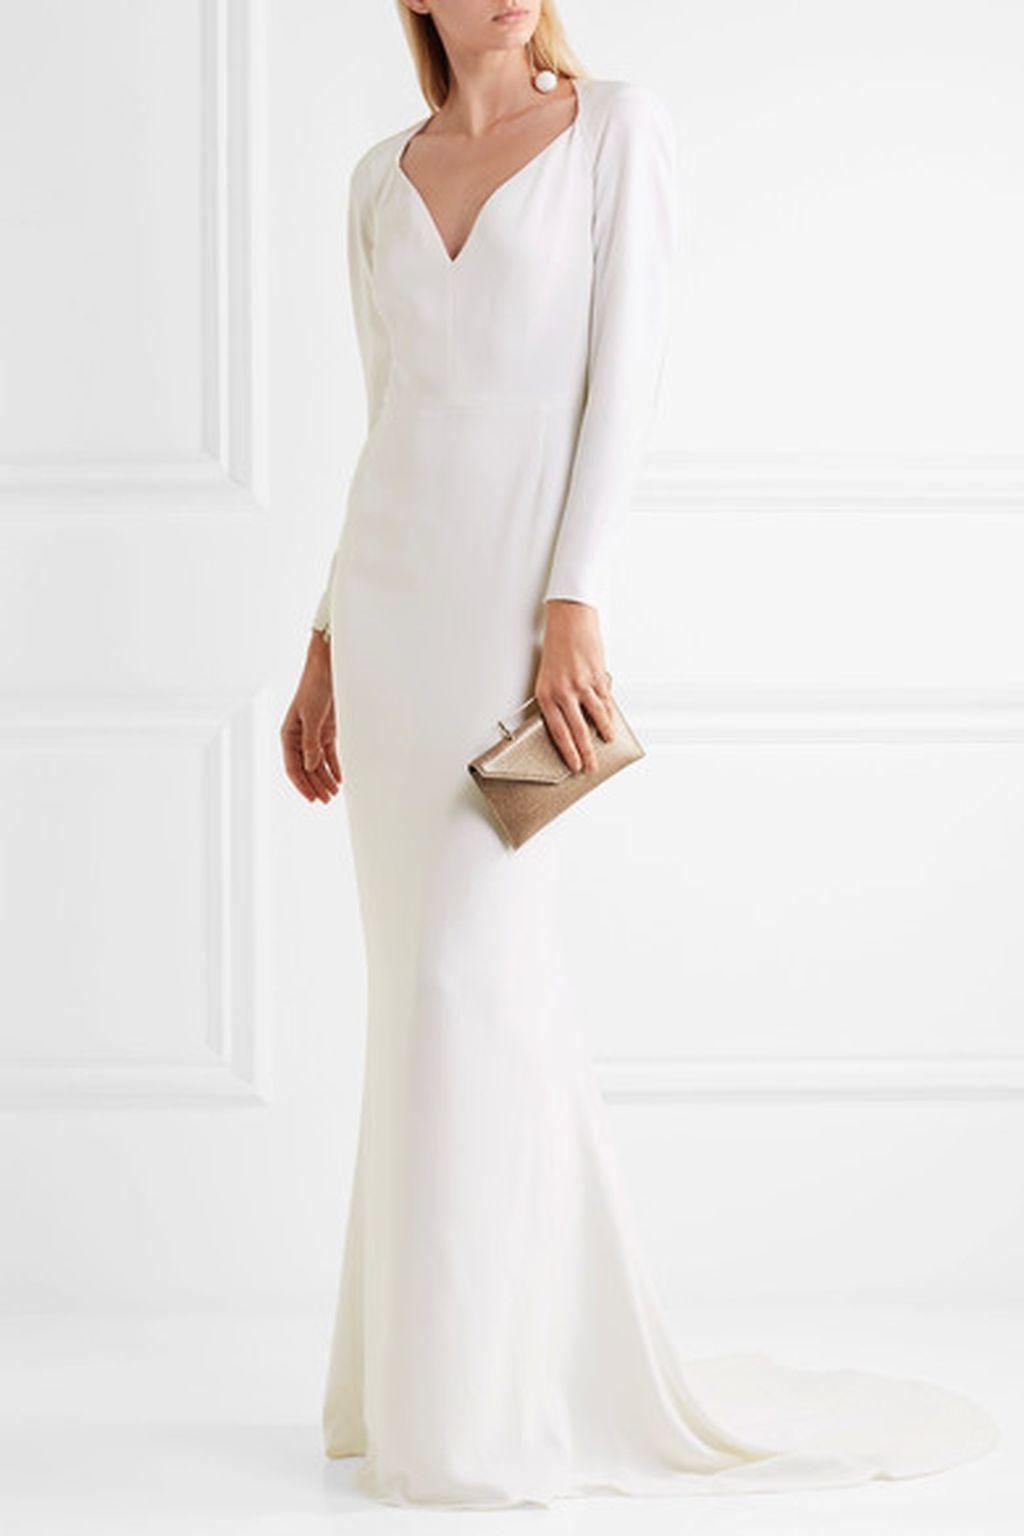 77+ Stella Mccartney Wedding Dress - Women\'s Dresses for Wedding ...